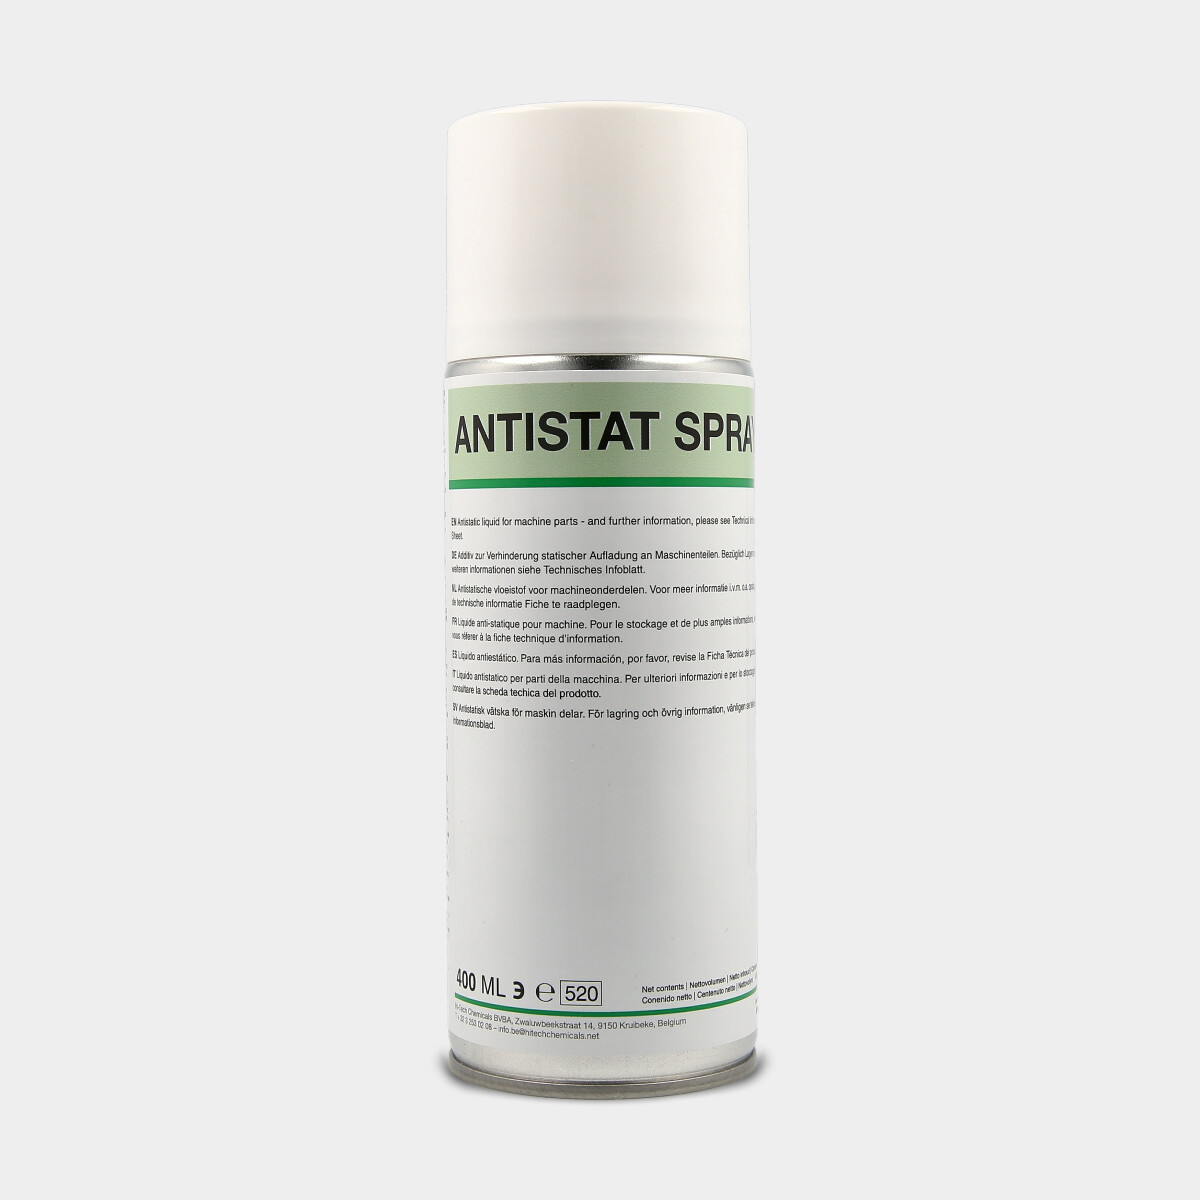 ANTISTAT SPREY 400 ml